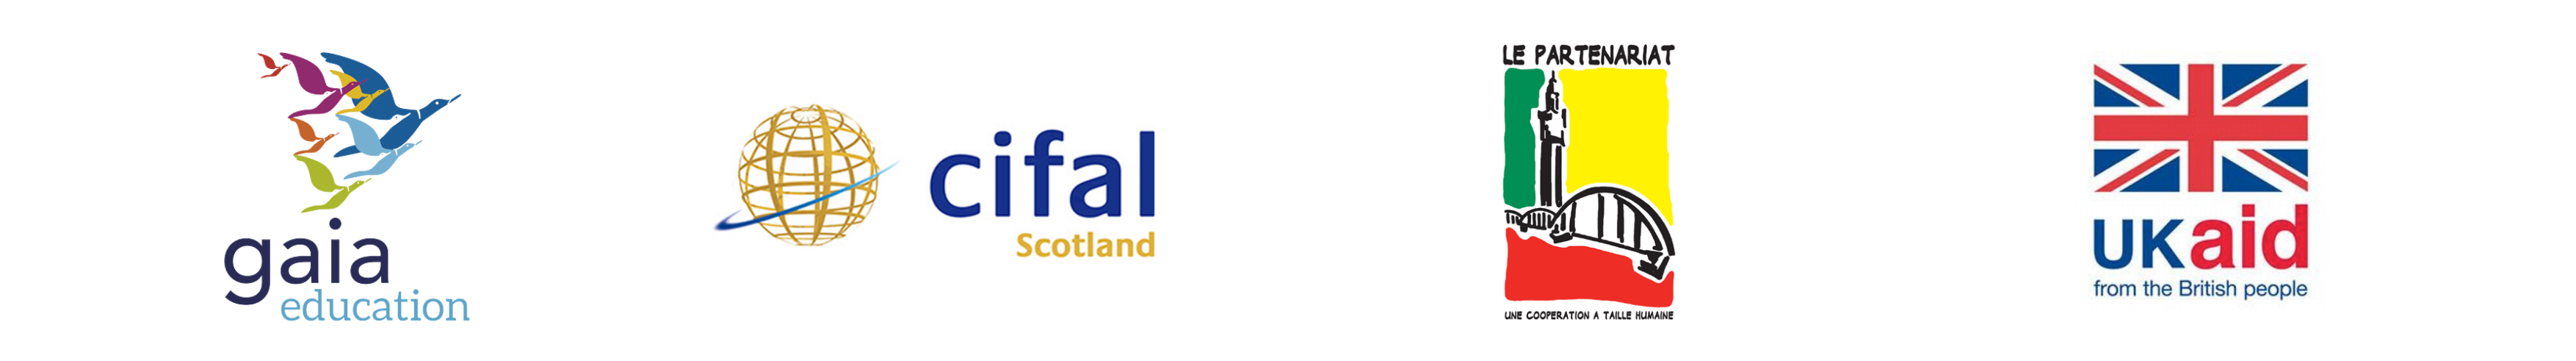 Senegal webpage banner image